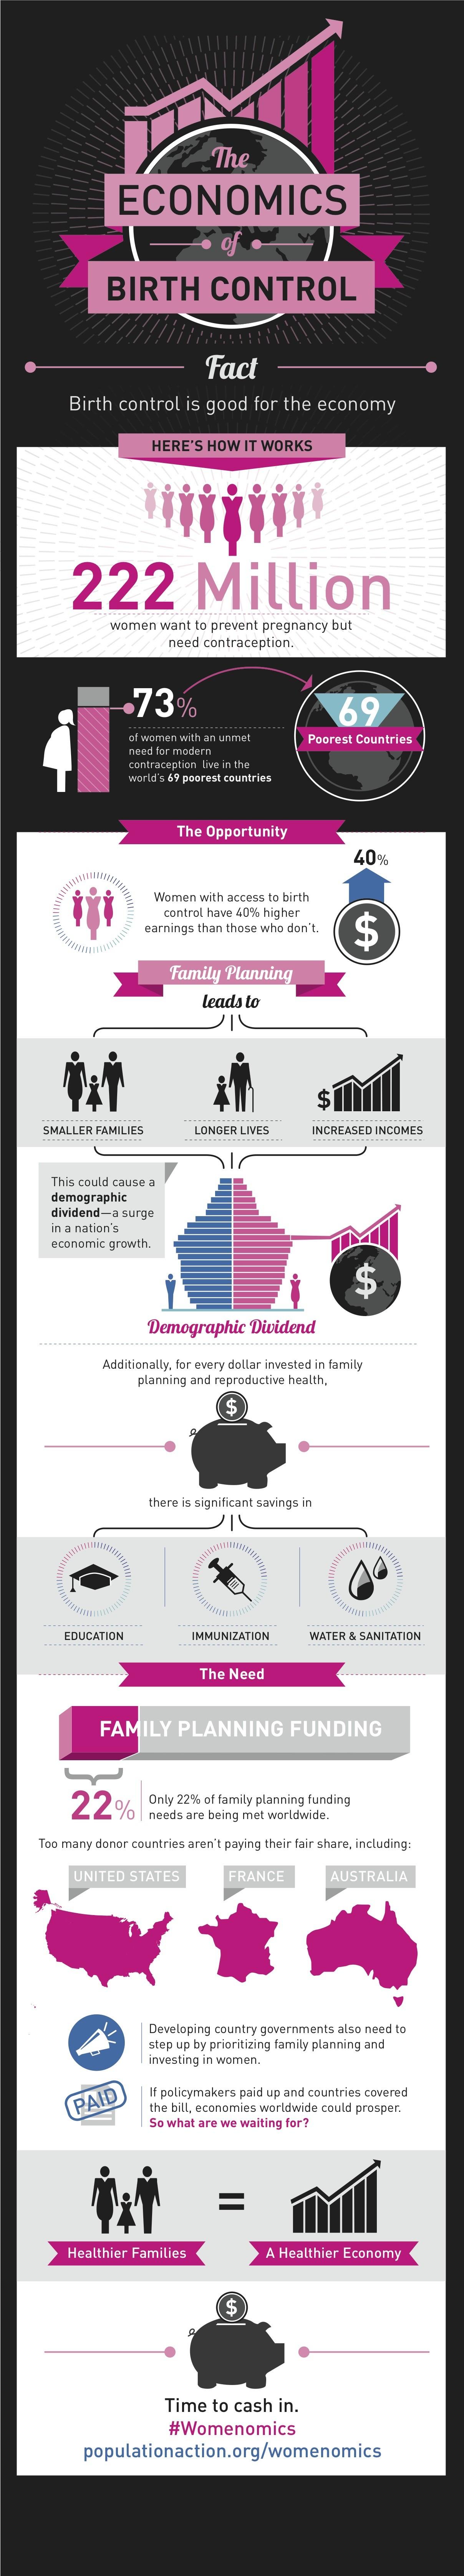 economics of birth control